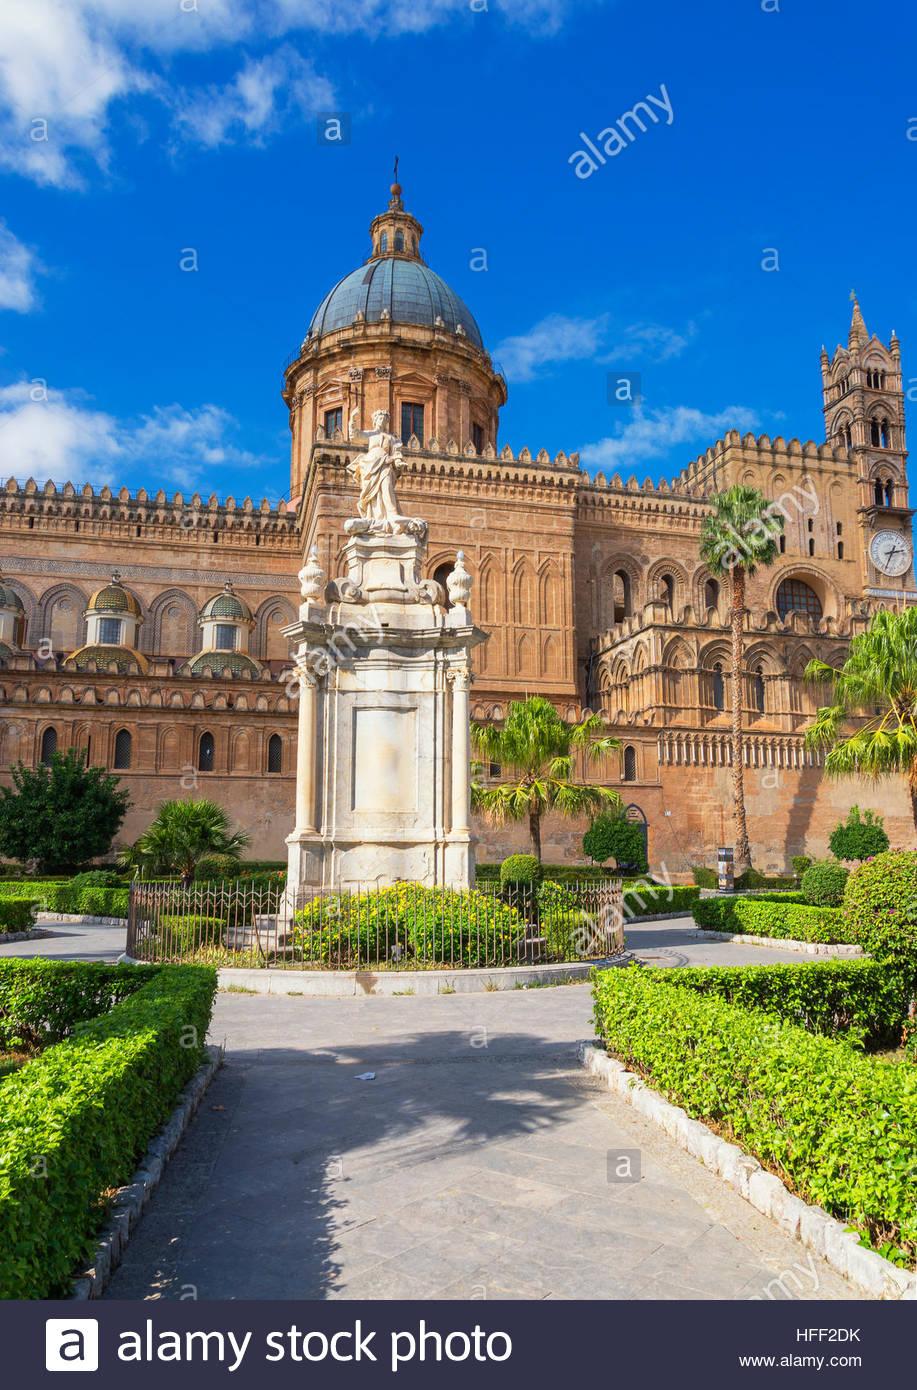 La cathédrale de Palerme, Palermo, Sicily, Italy, Europe, Photo Stock